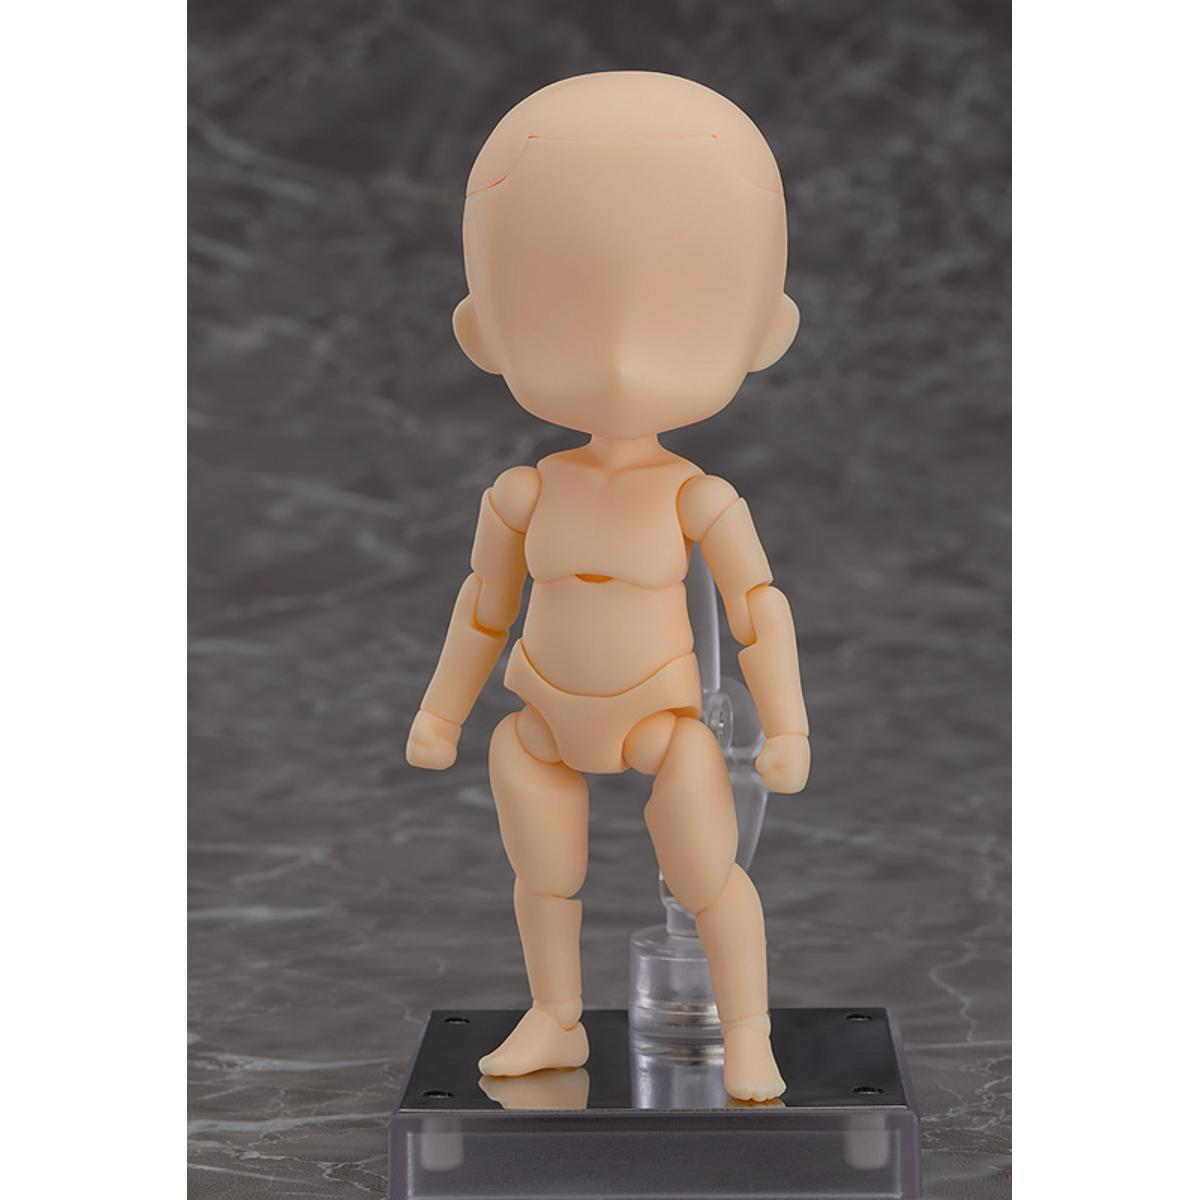 Nendoroid Doll archetype 1.1: Boy (Almond Milk)